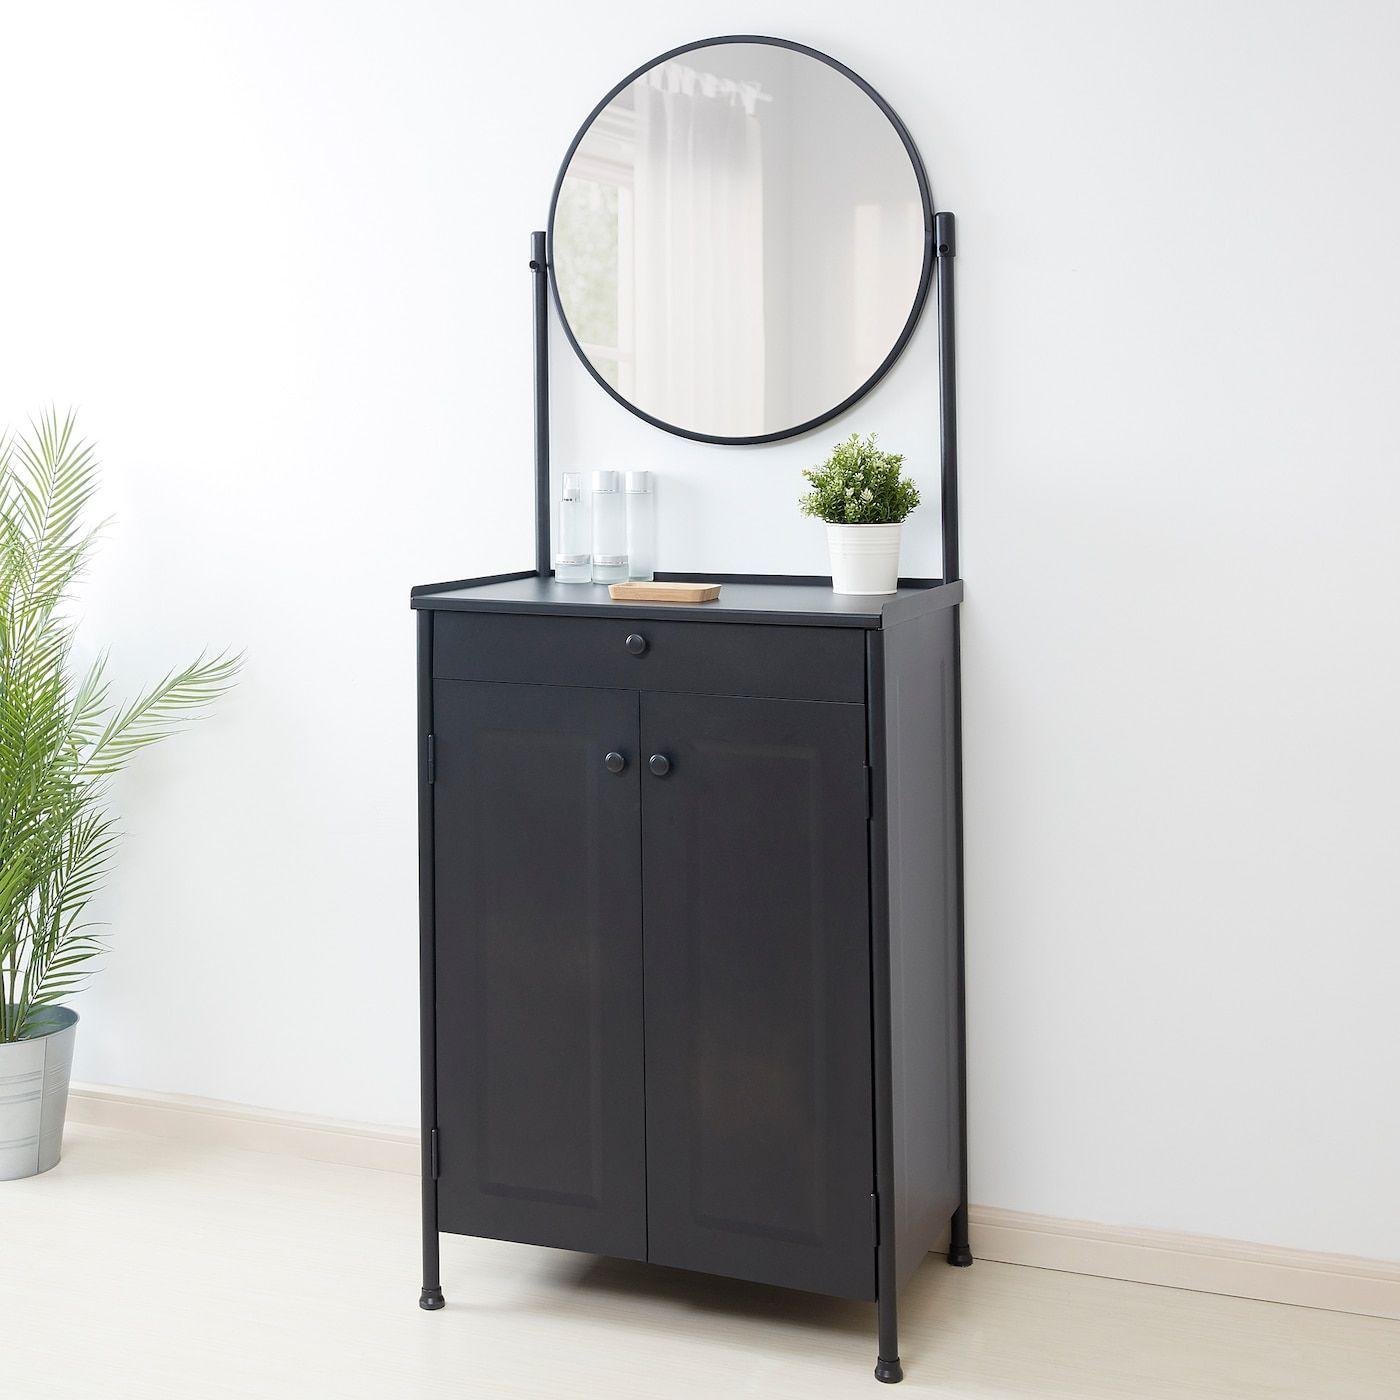 IKEA – KORNSJÖ Cabinet with mirror